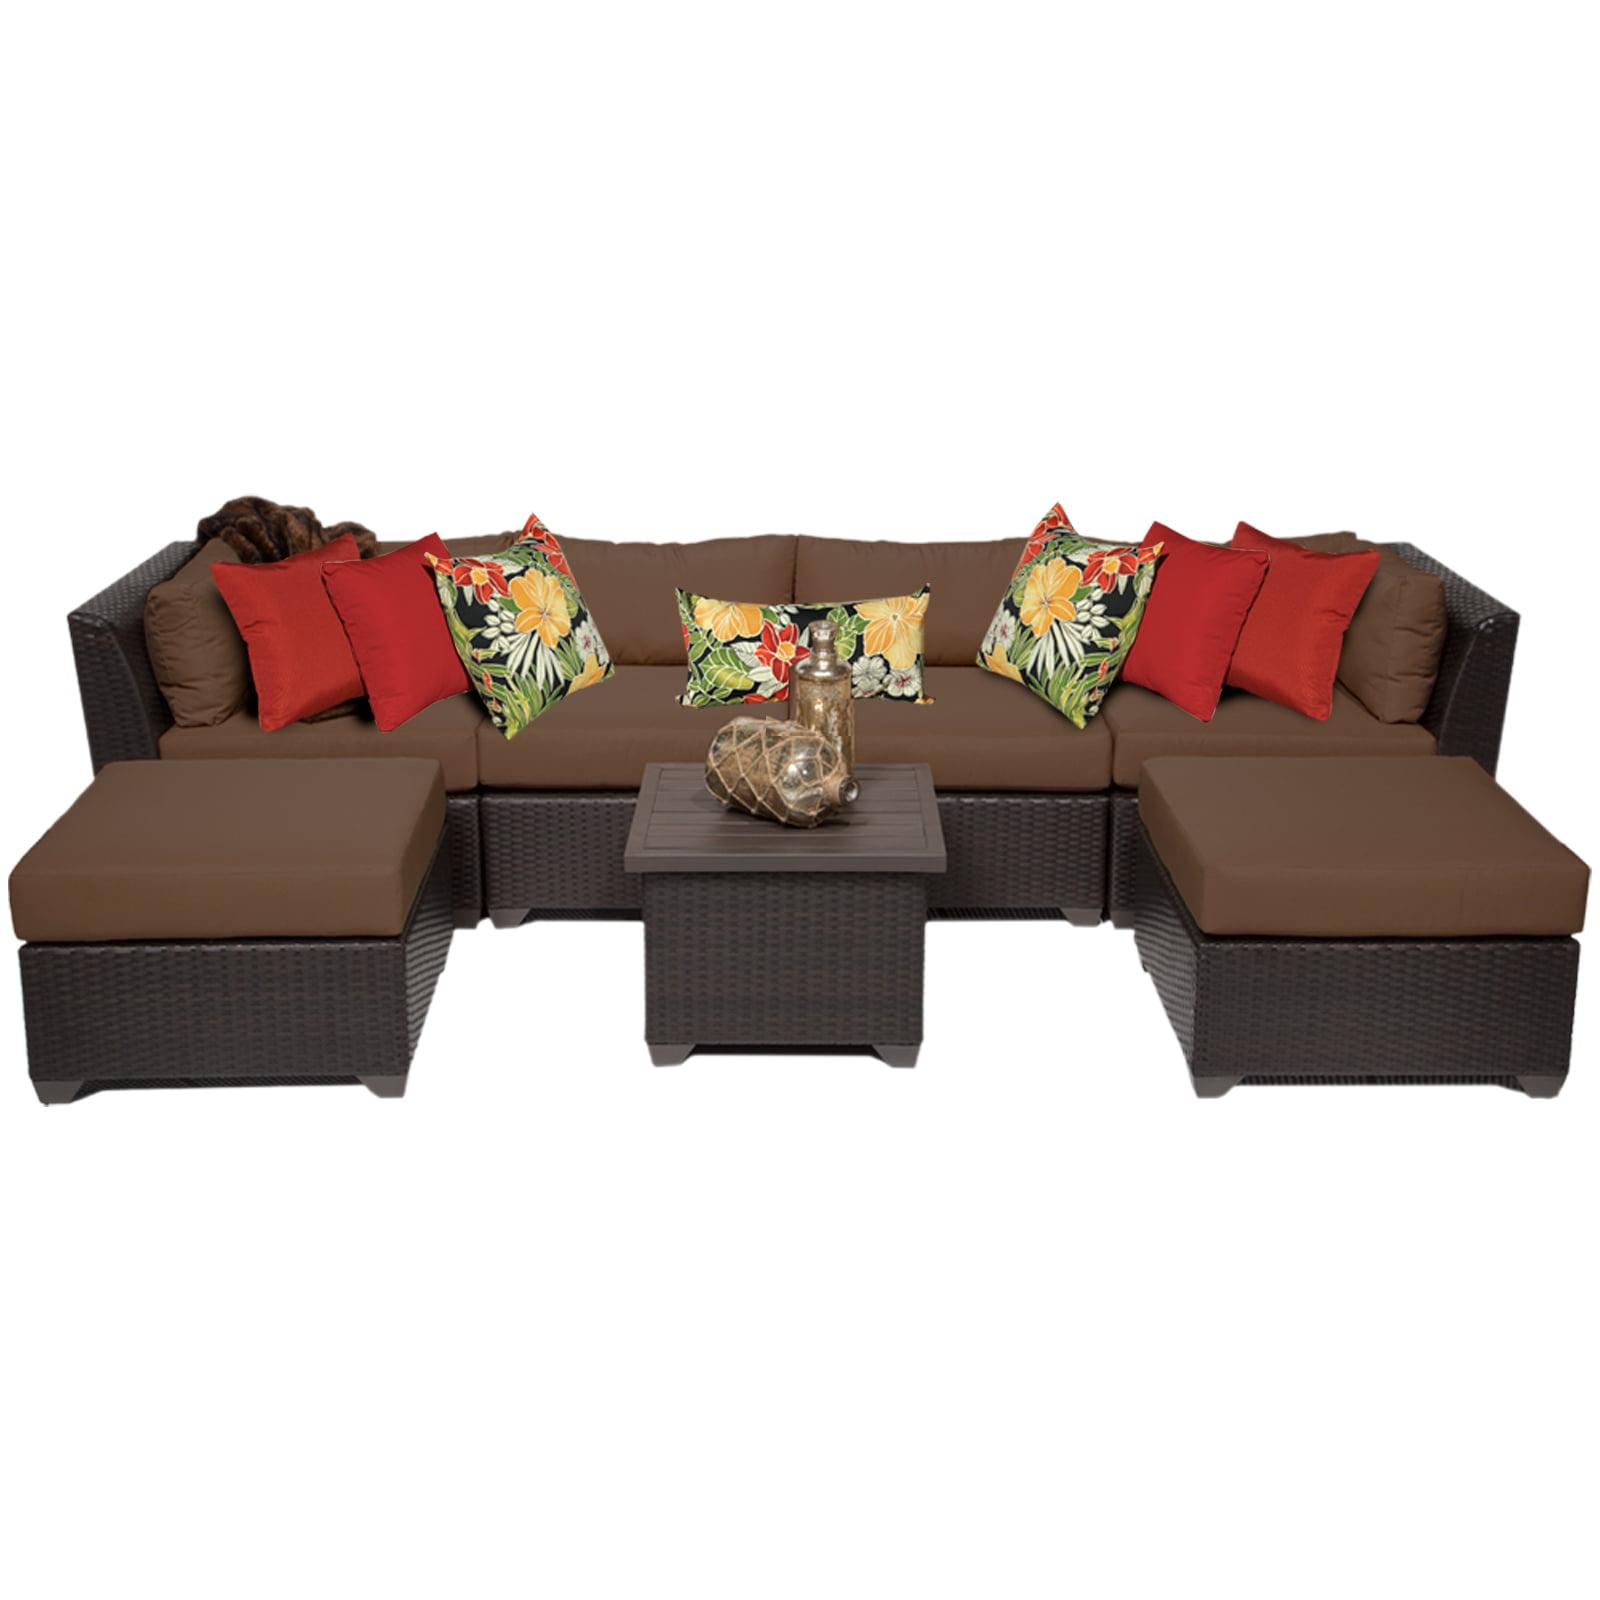 Bermuda 7 Piece Outdoor Wicker Patio Furniture Set 07a by TK Classics